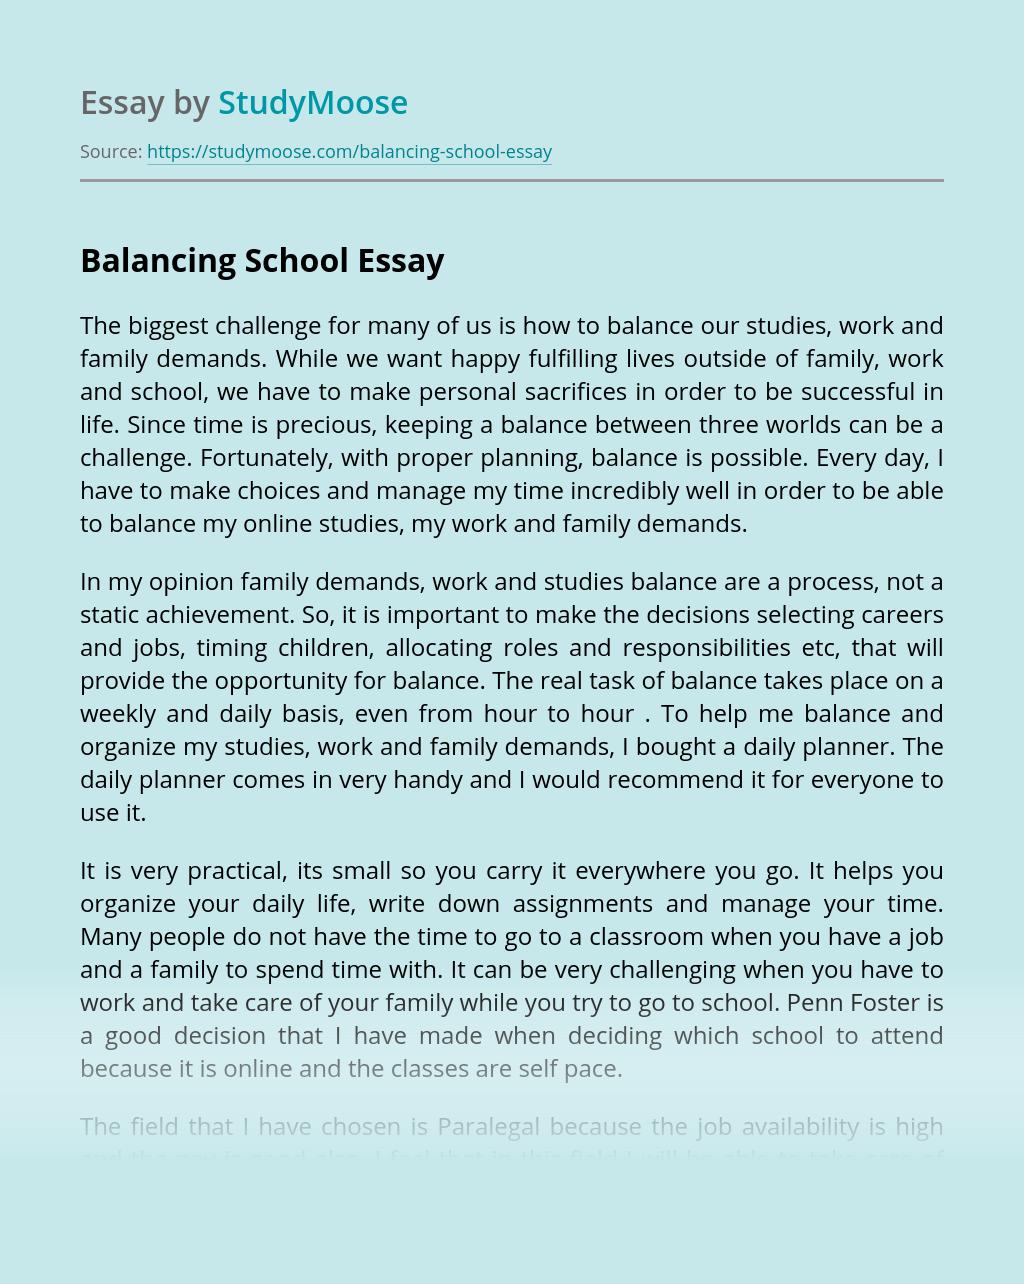 Balancing School